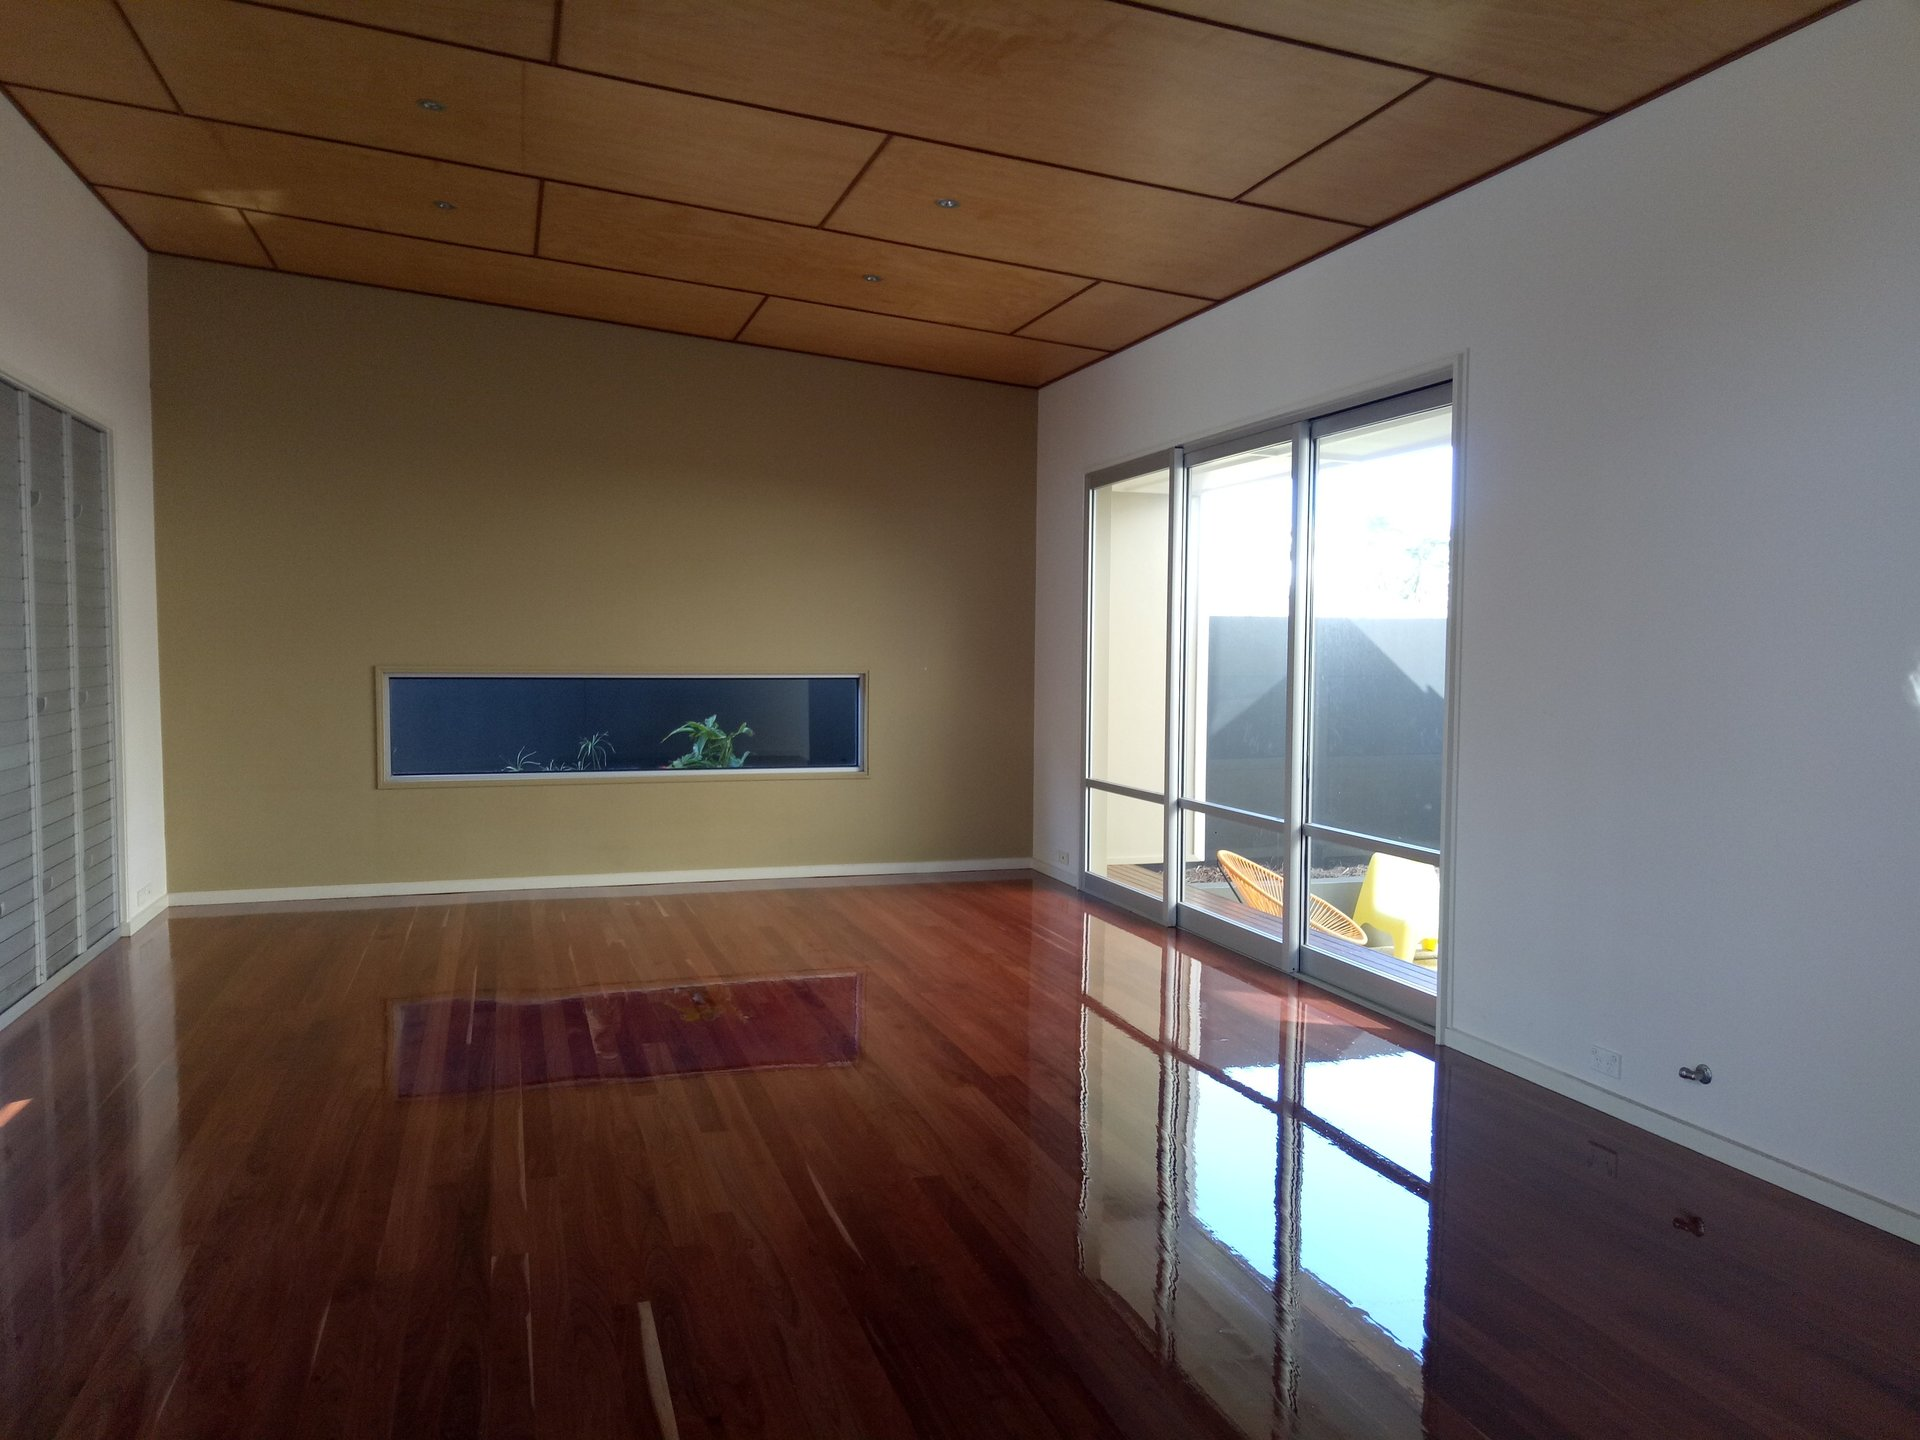 Quality timber flooring